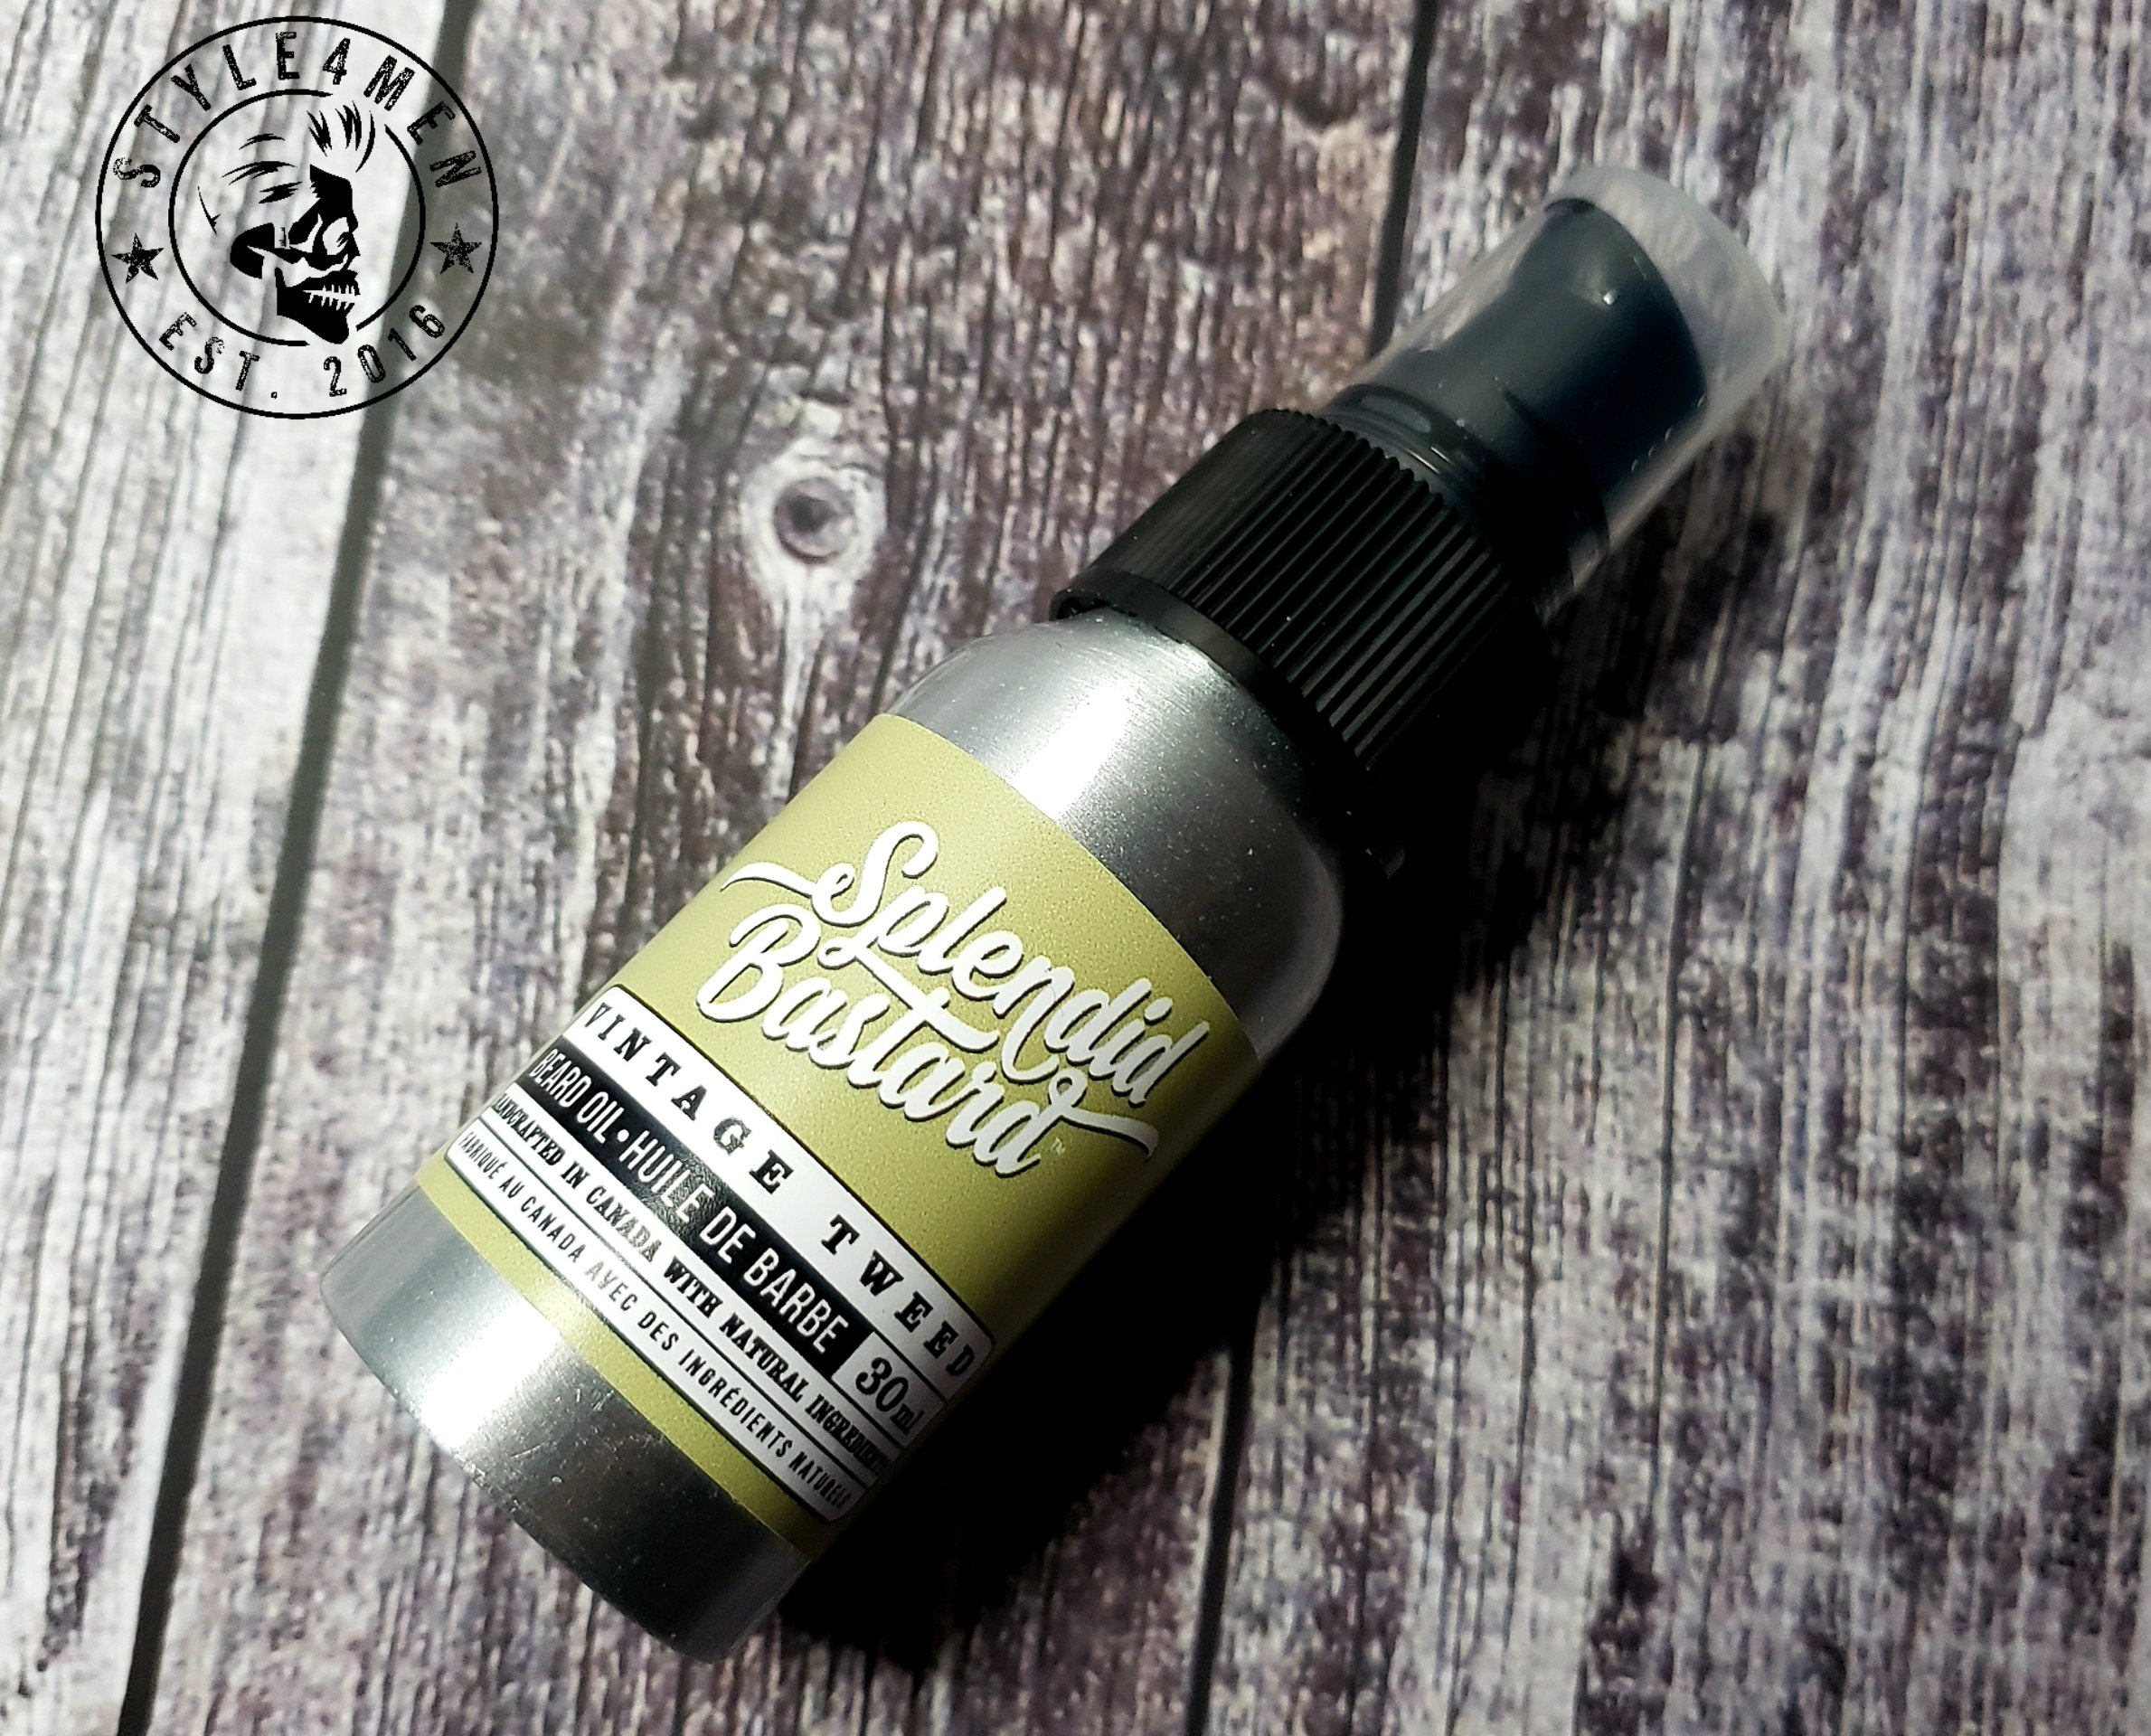 SplendiddBastard Beard Oil